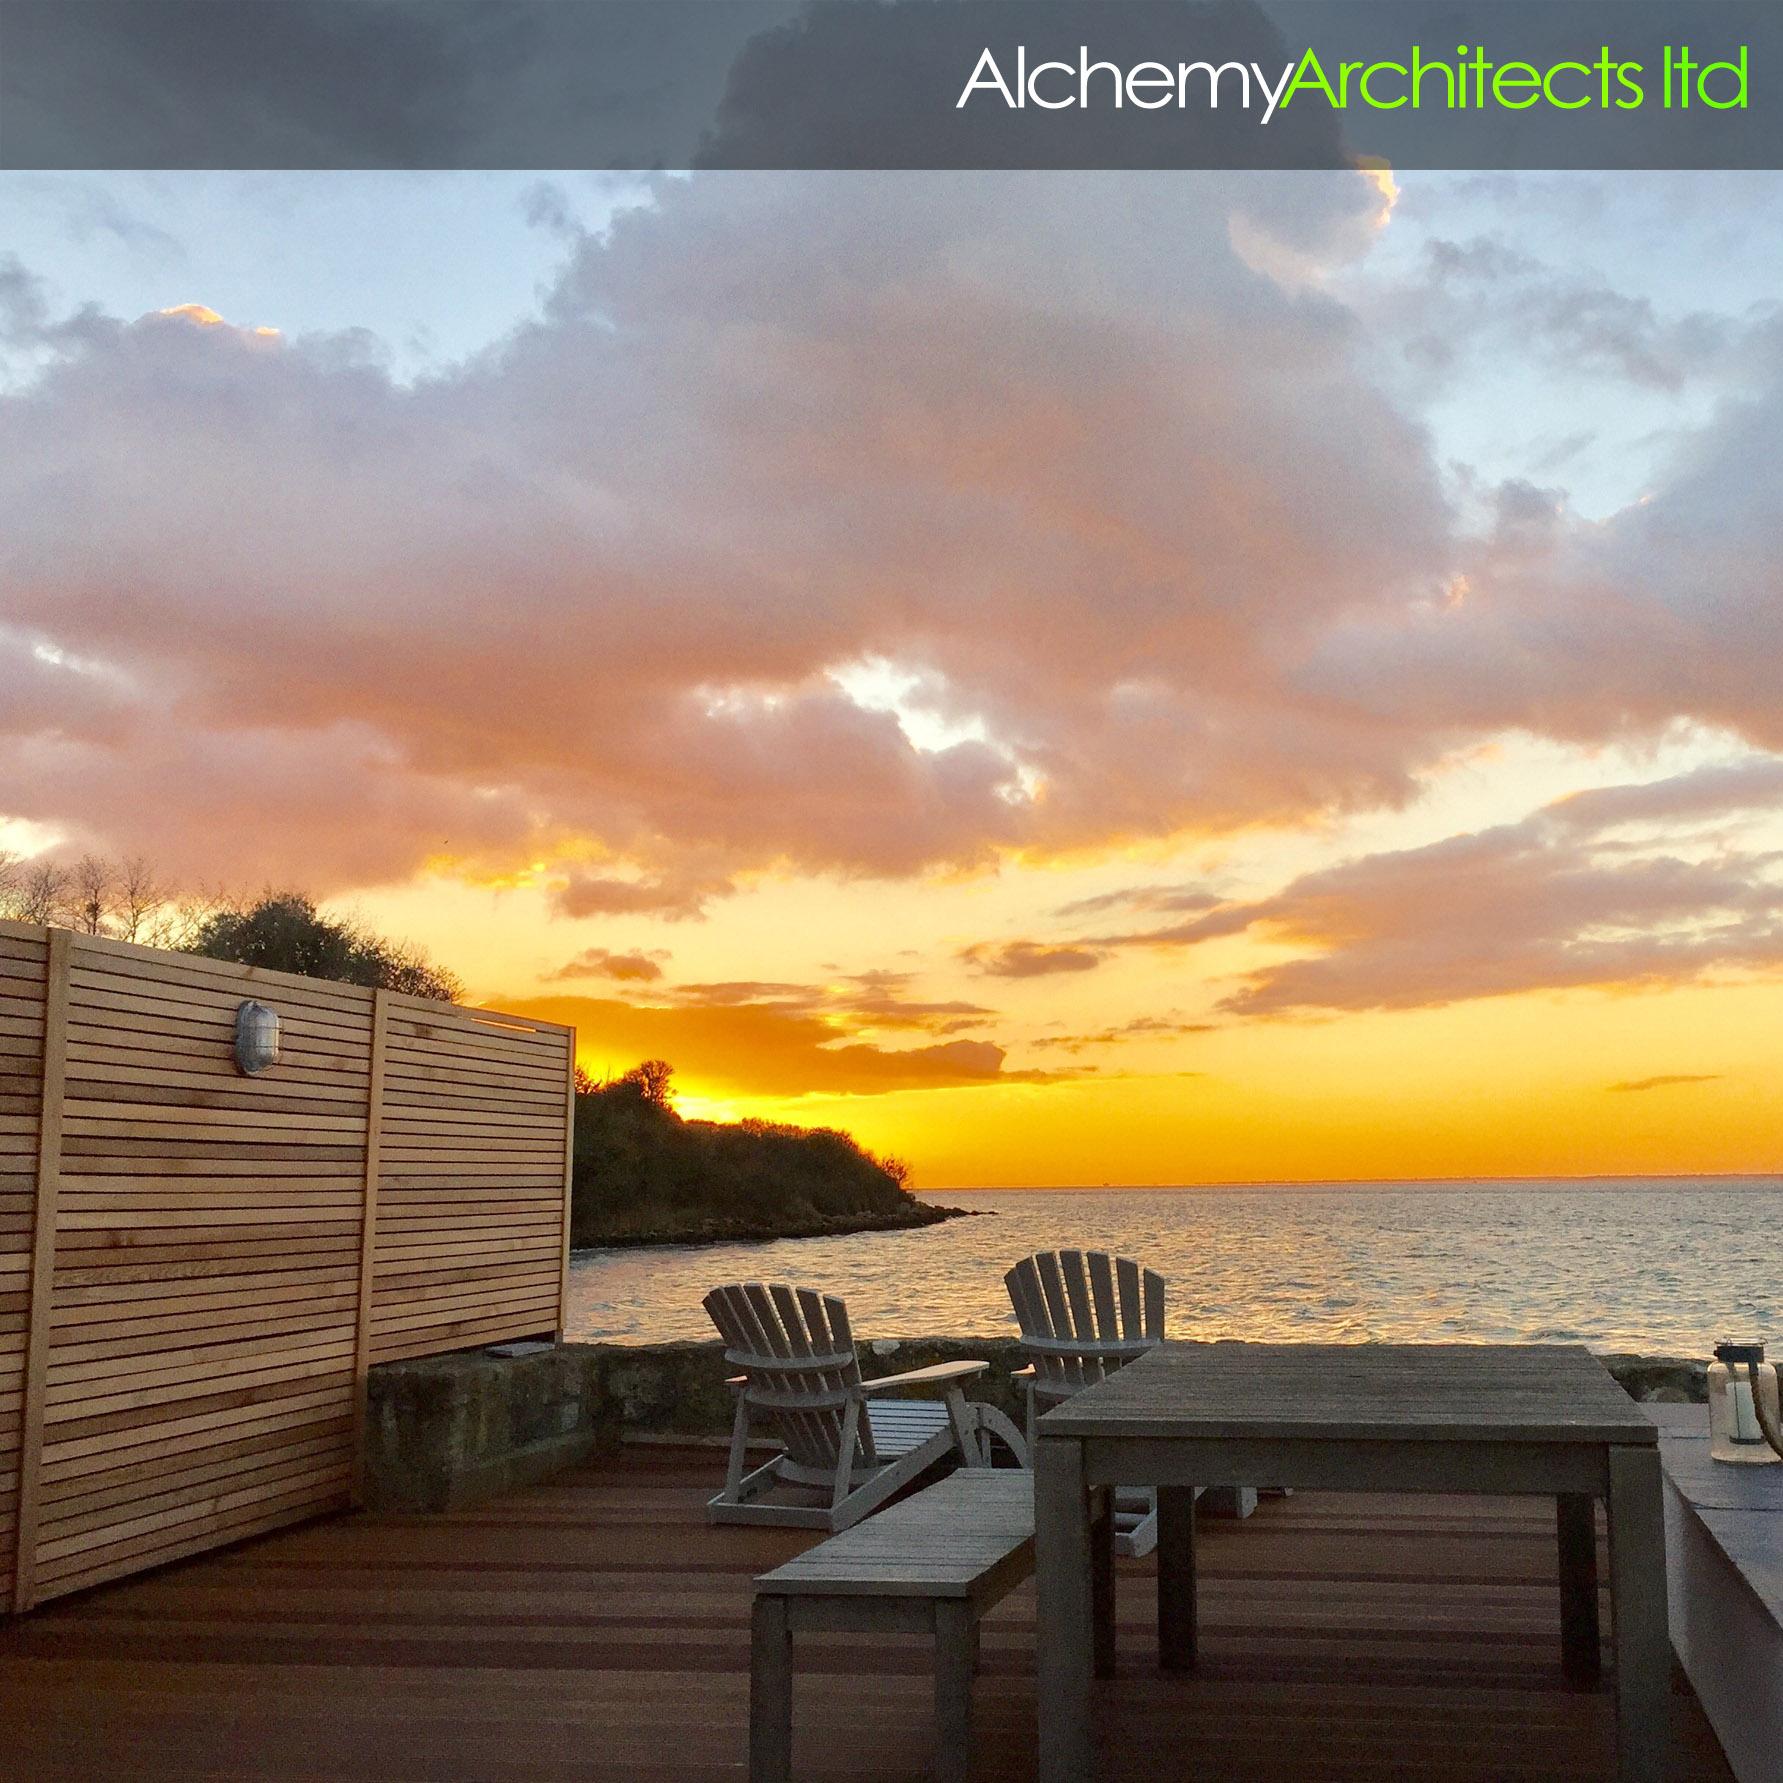 designer sunset deck.JPG